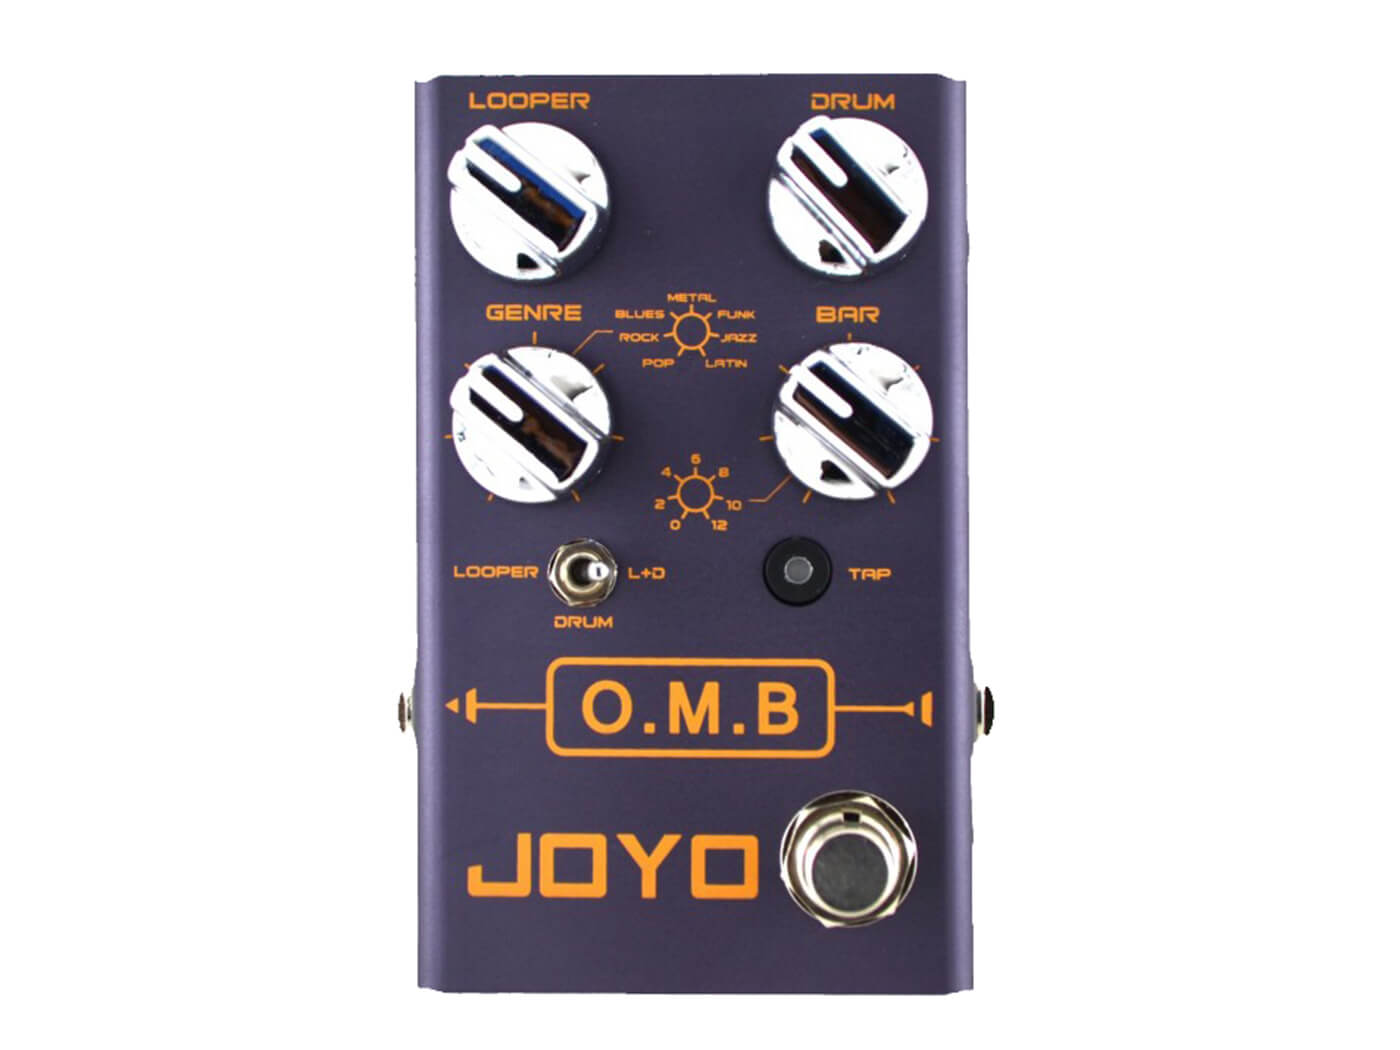 Joyo OMB Looper/Drum machine